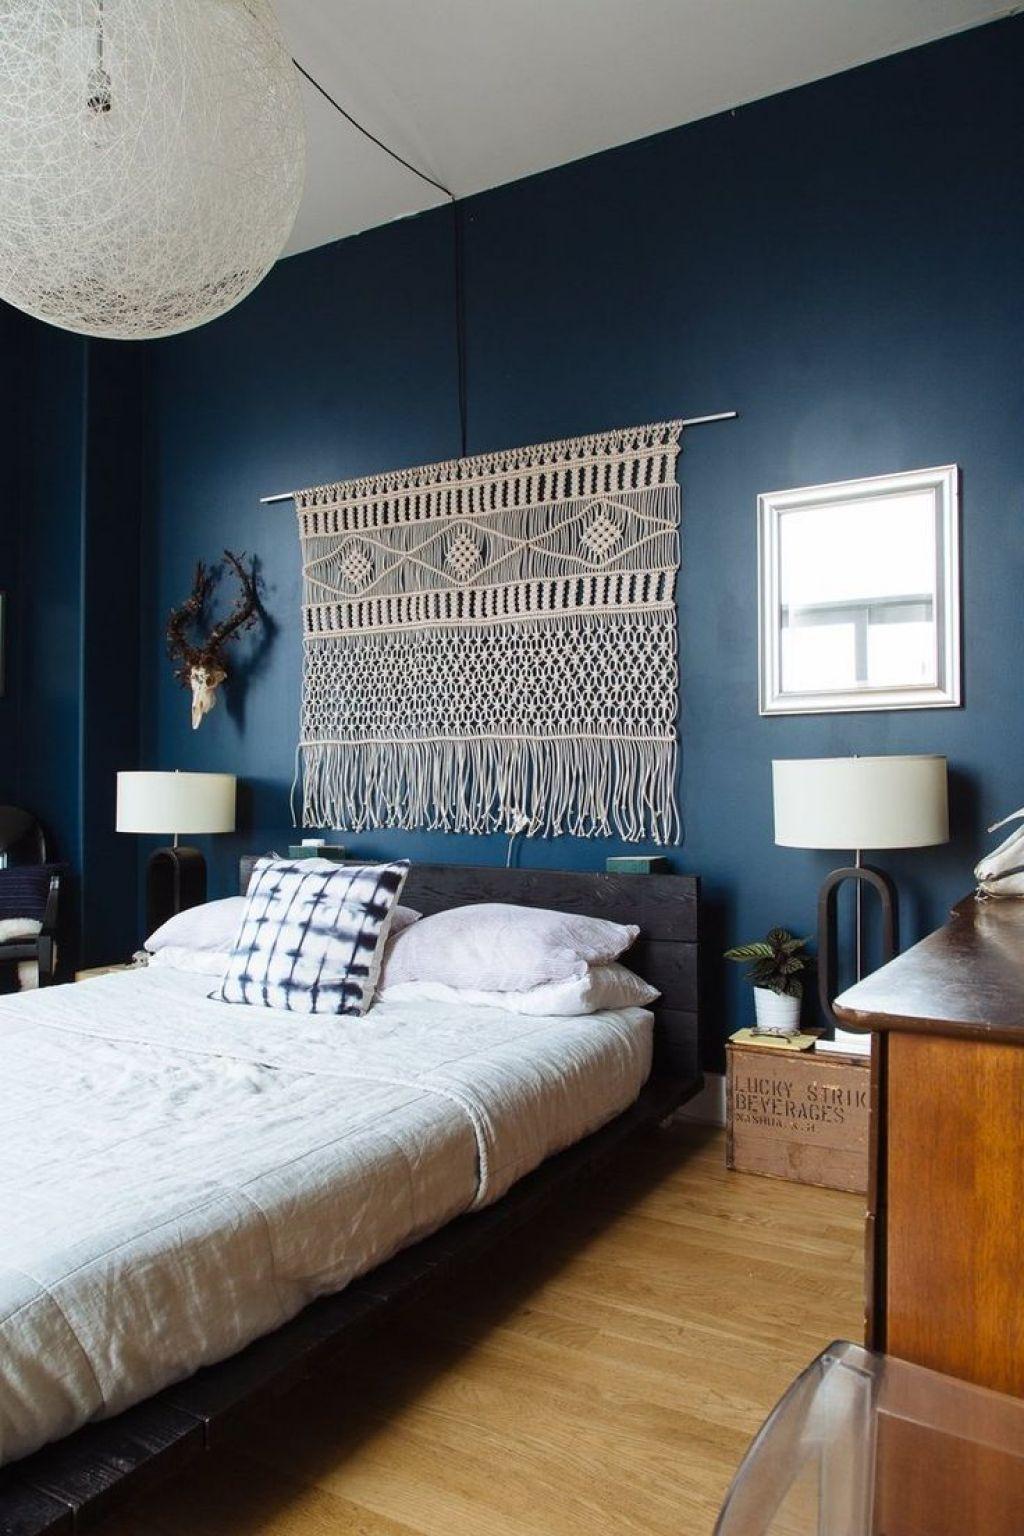 Room Bedroom With Dark Blue Walls